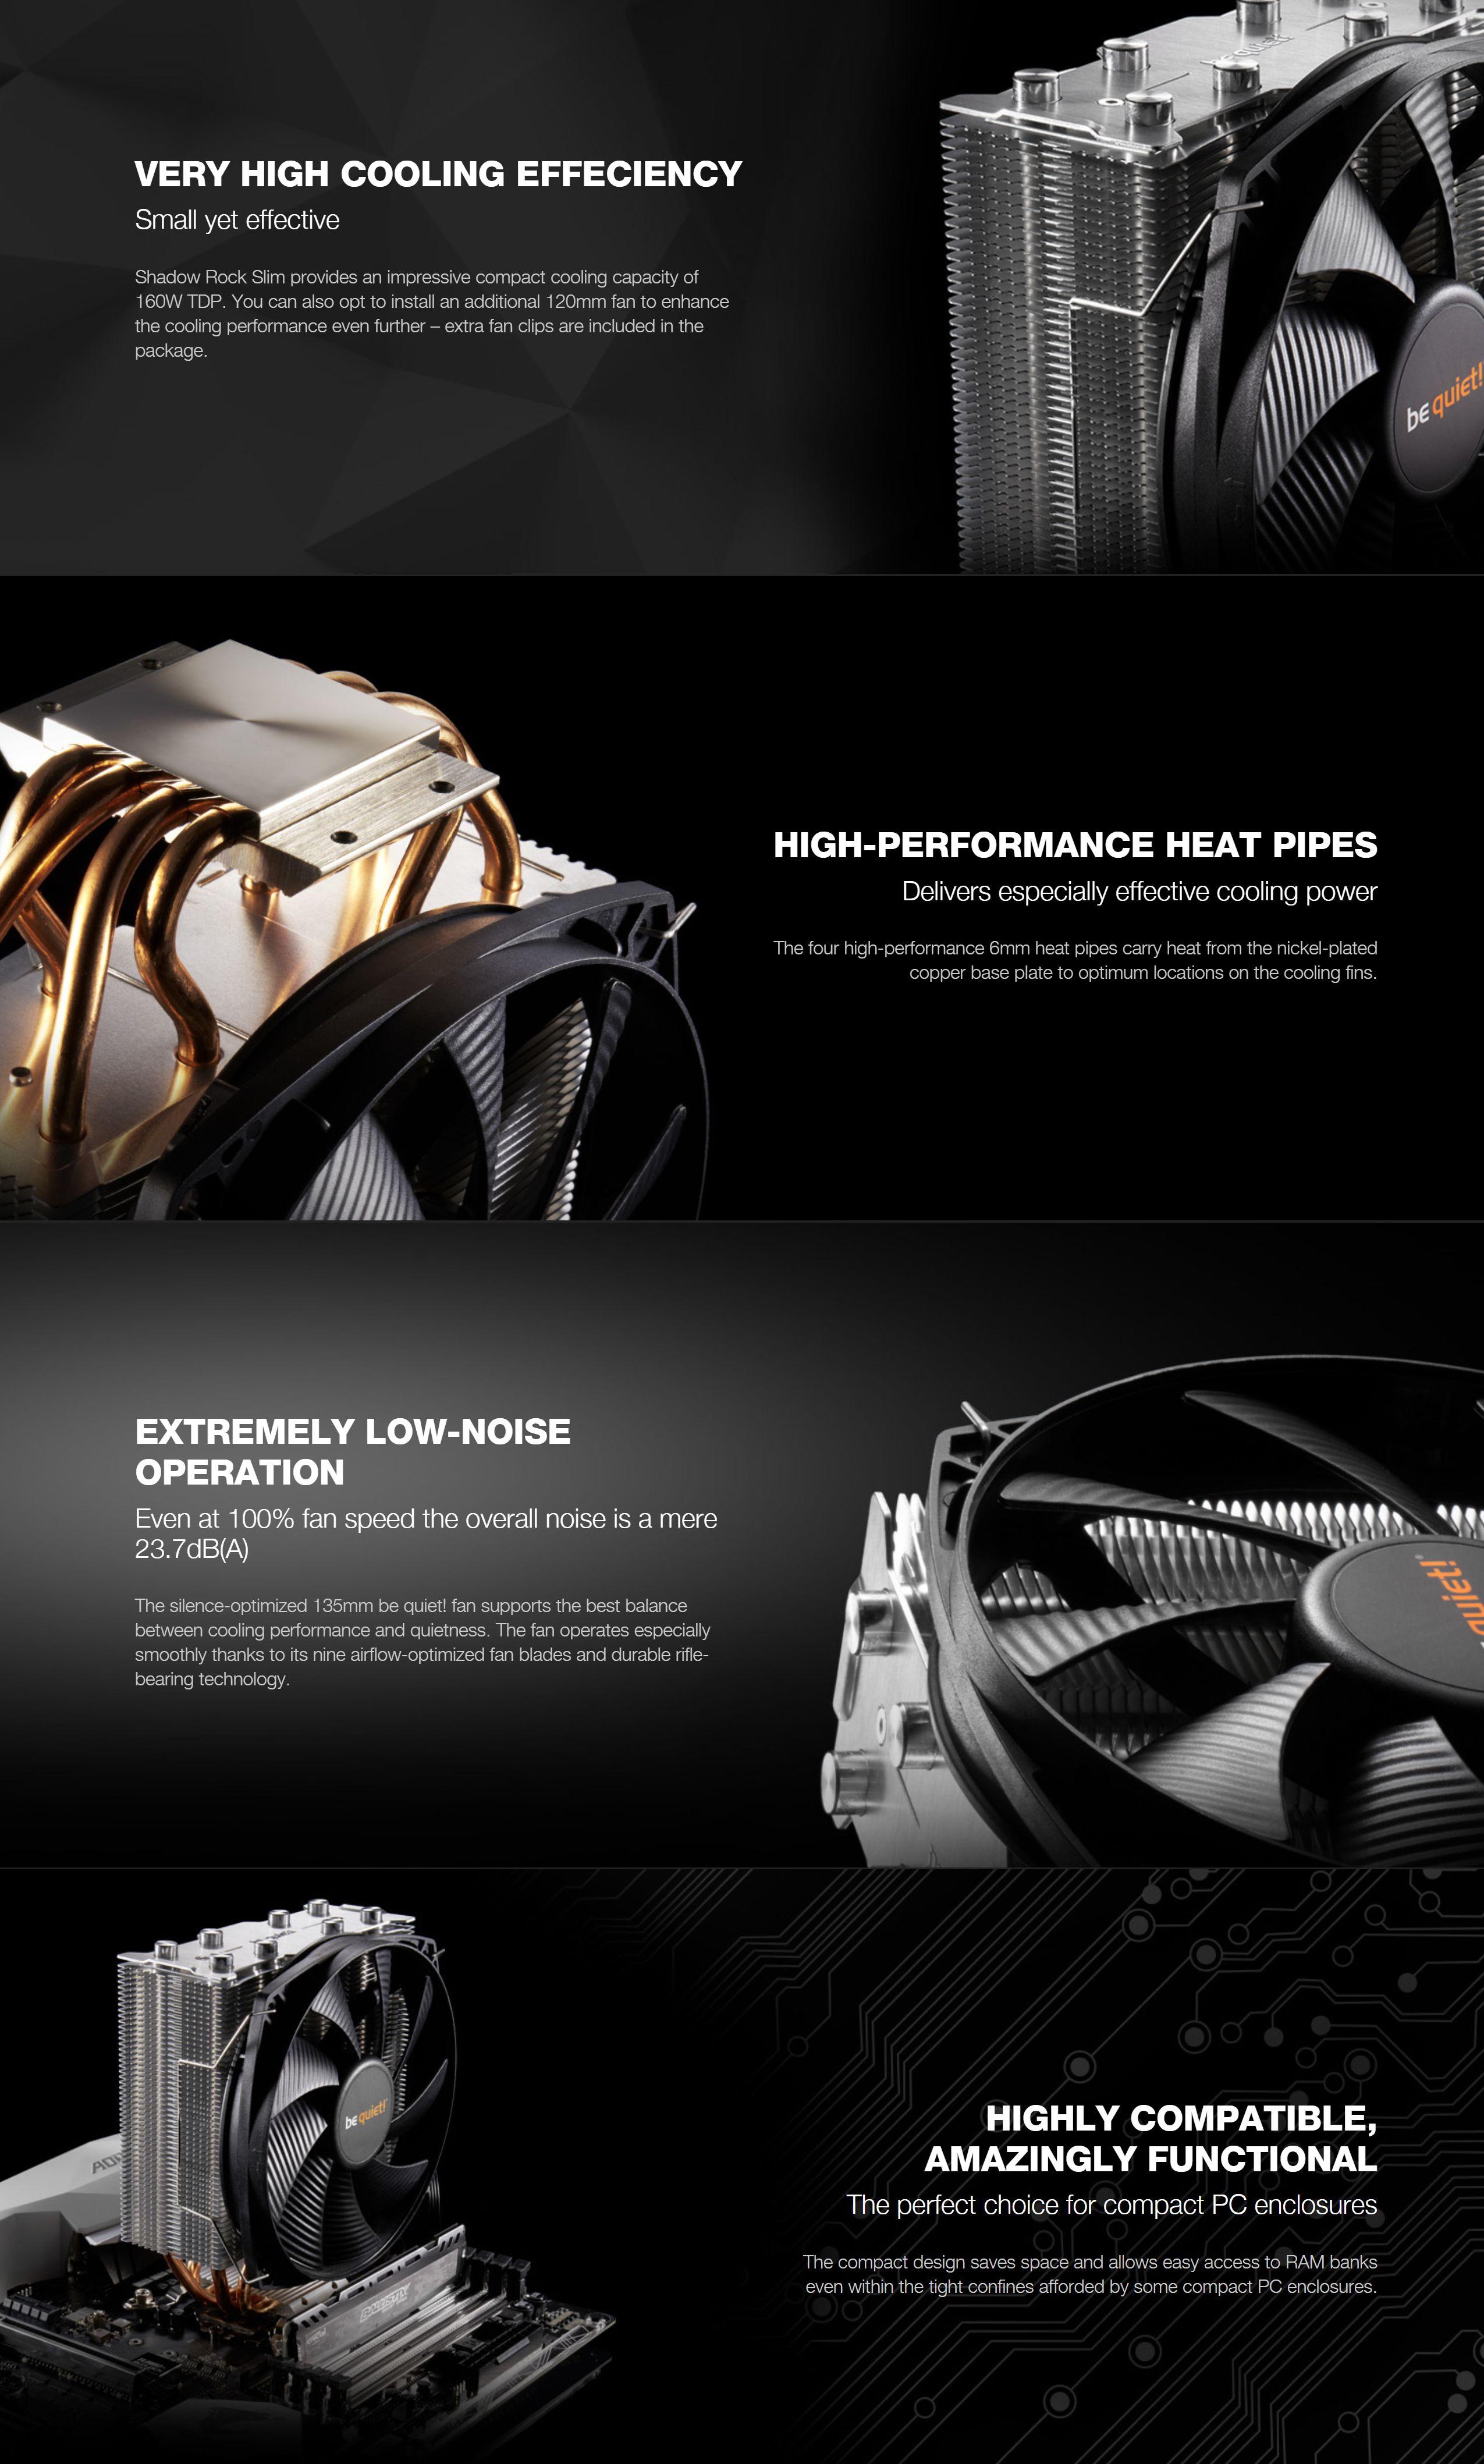 #1711 - 'SHADOW ROCK SLIM silent premium Air coolers from be quiet!' - www_bequiet_com.jpg